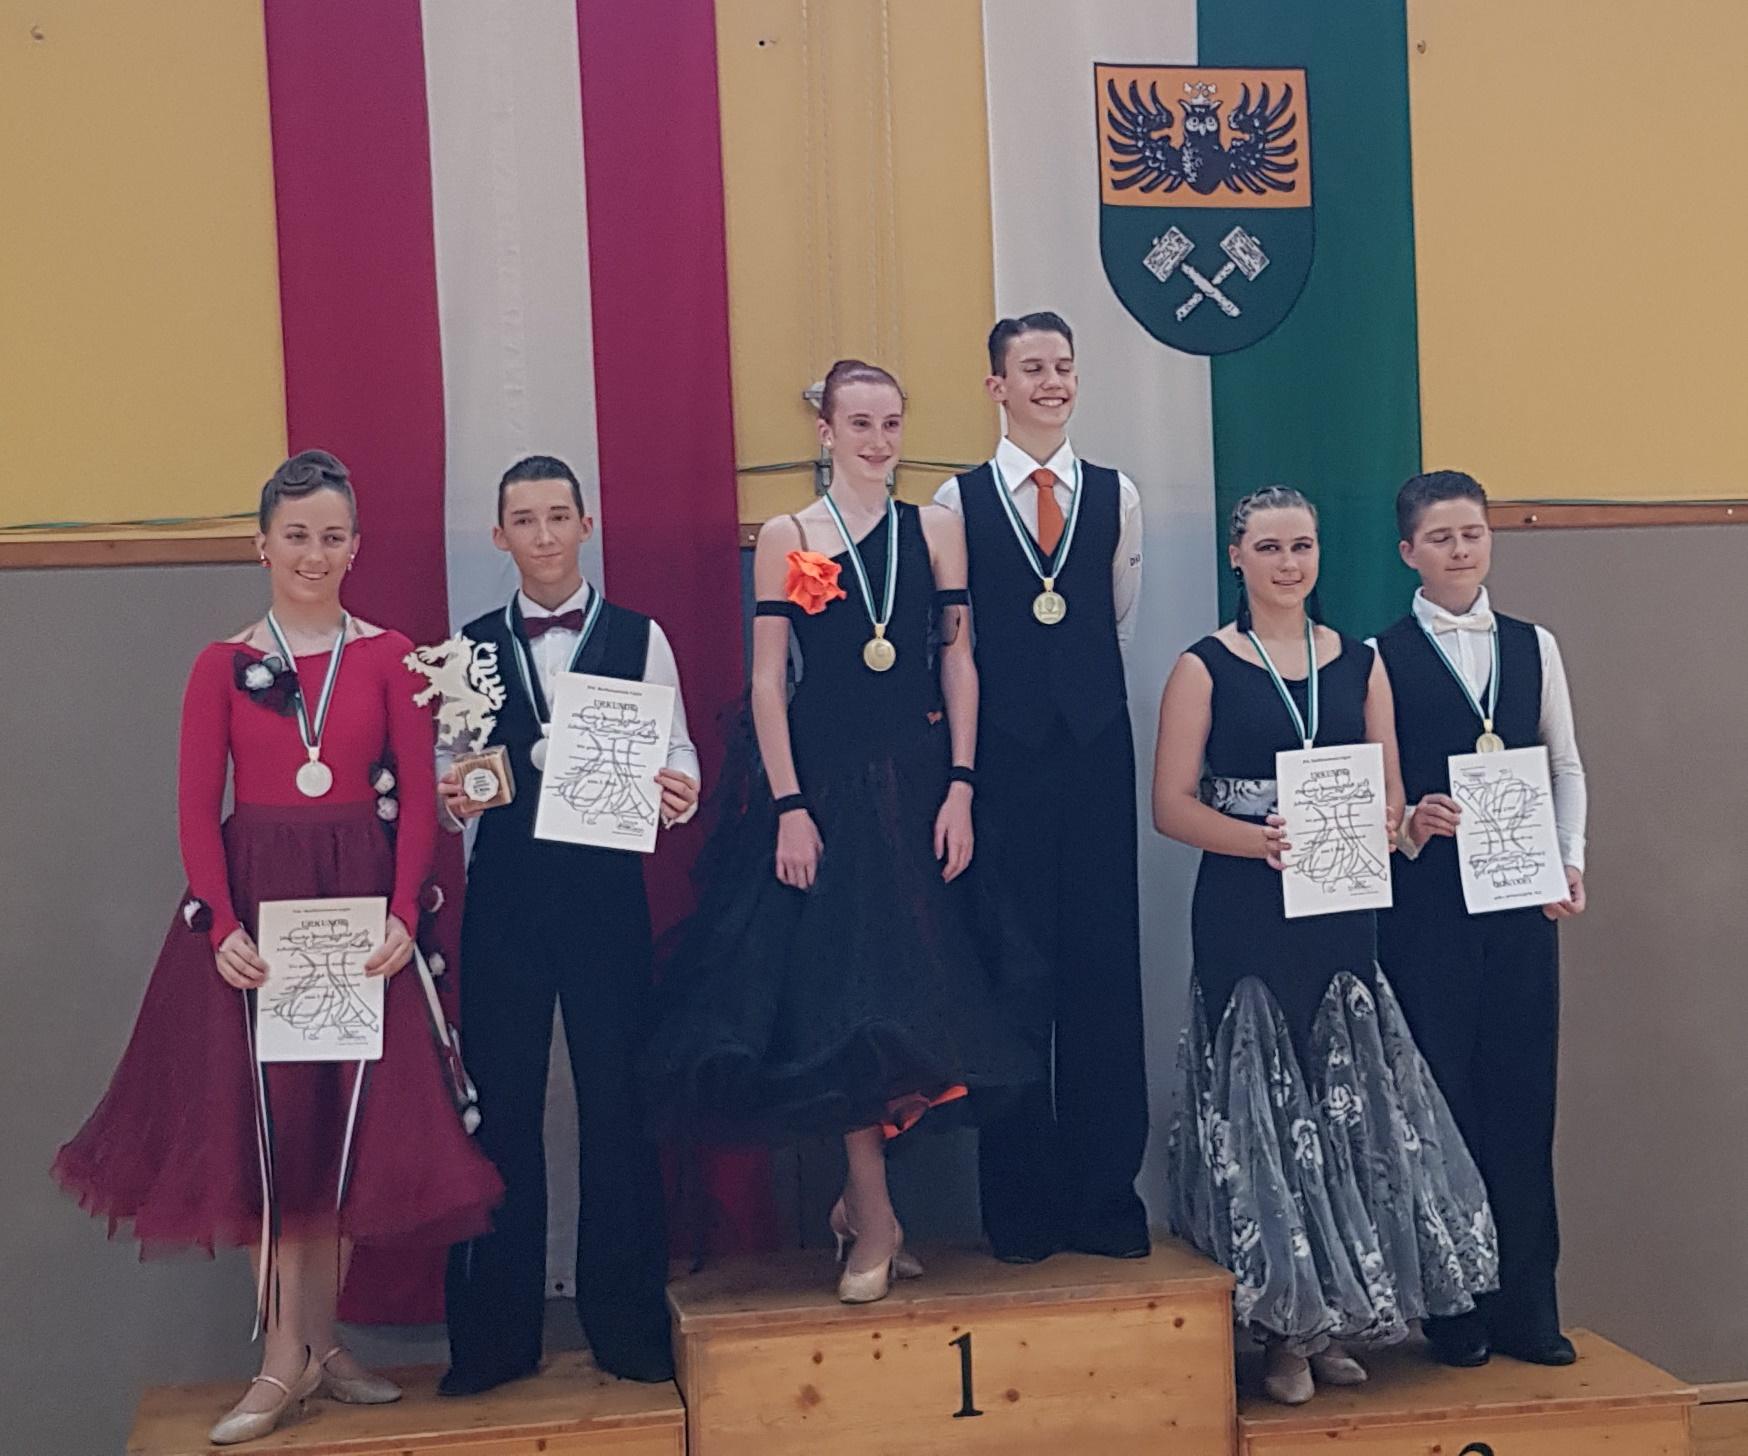 Junioren II Standard C - Steirischer Meister Alexander Fandl/Livia Strauss - Eleganca Köflach